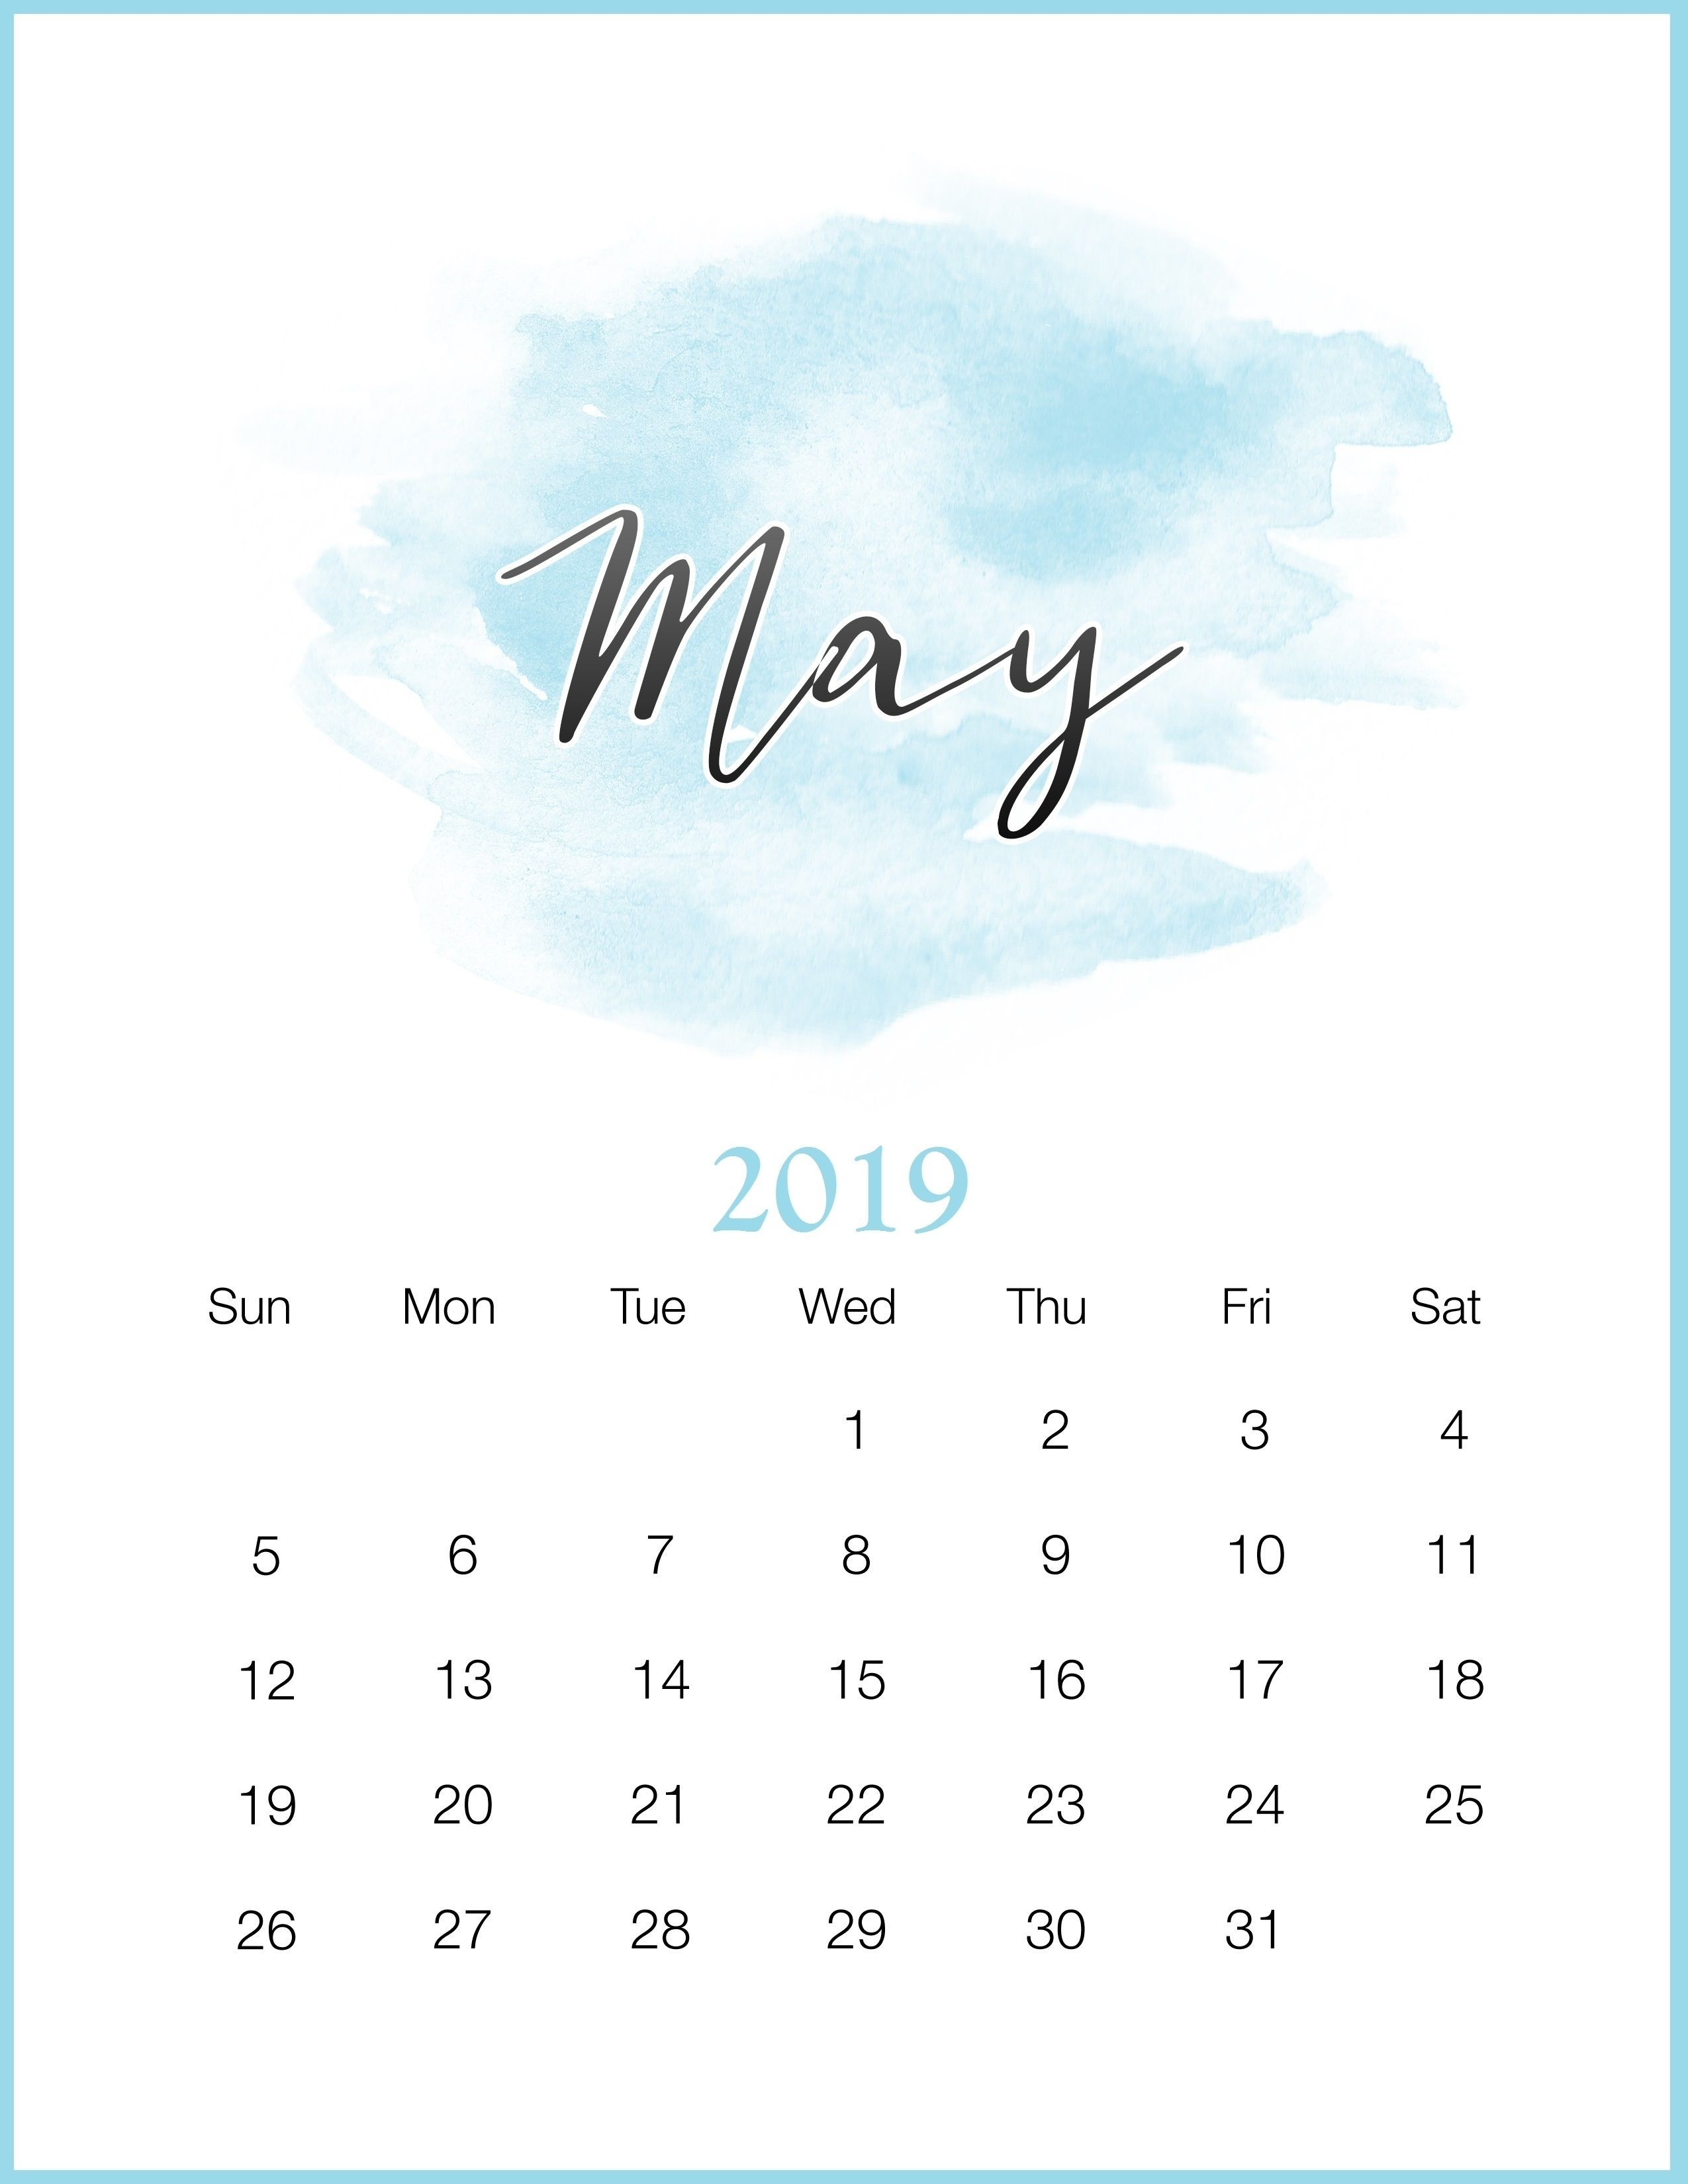 Calendario Mayo 2017 Para Imprimir Word Más Populares Watercolor 2019 Monthly Printable Calendar Calendar 2019may 2019 Of Calendario Mayo 2017 Para Imprimir Word Recientes Pin by Tara On Stationary Pinterest